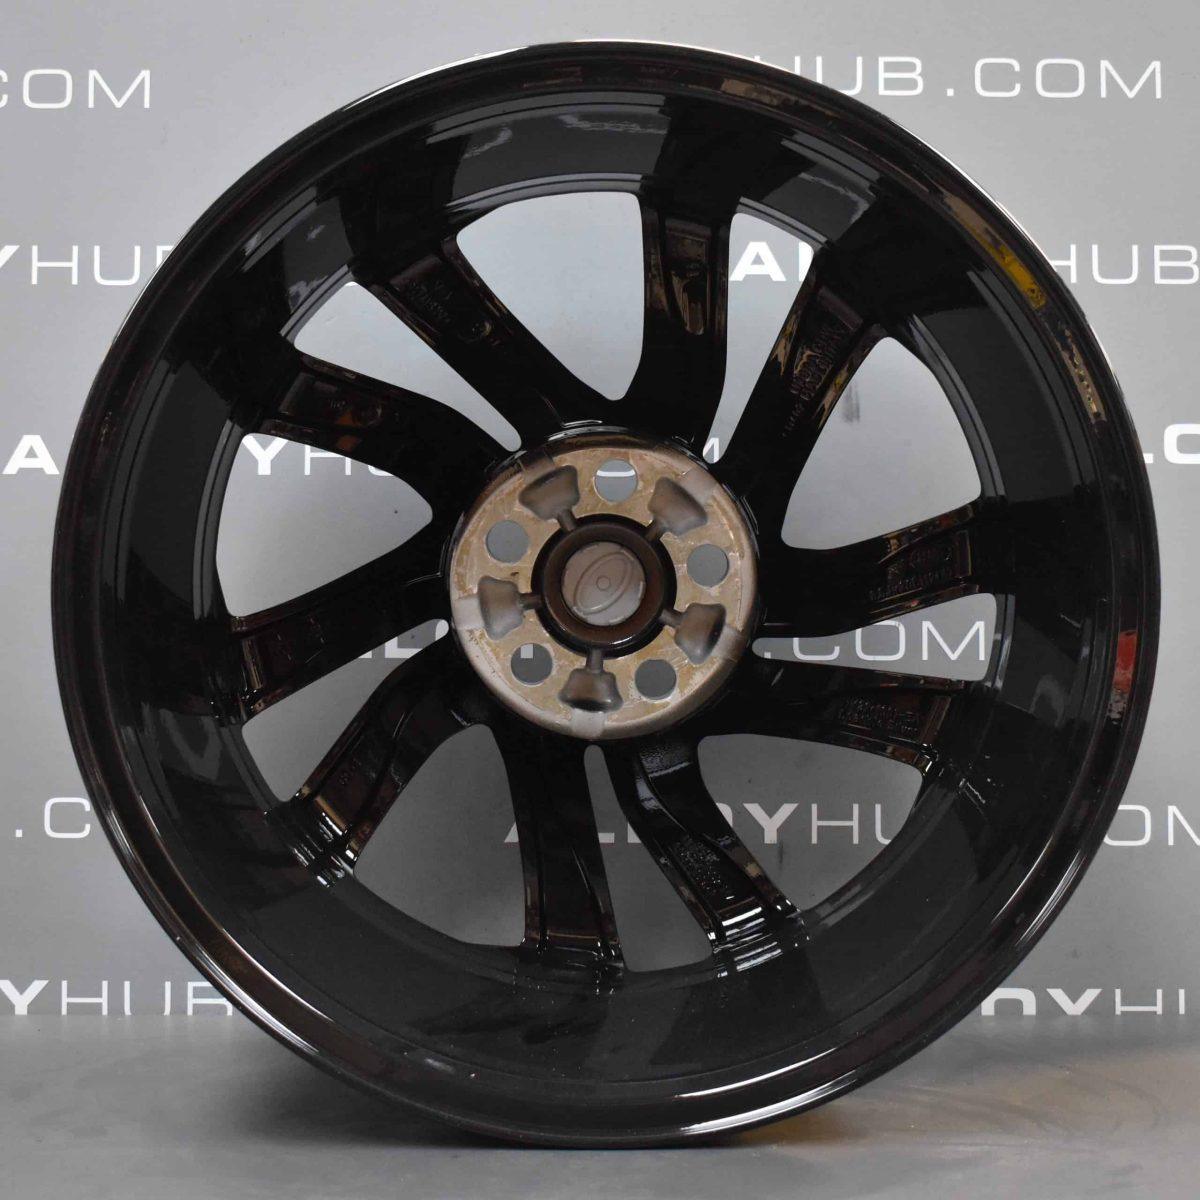 Genuine Land Rover Discovery 5 Style 5011 5 Split-Spoke 20″ inch Gloss Black Alloy Wheels LR081587